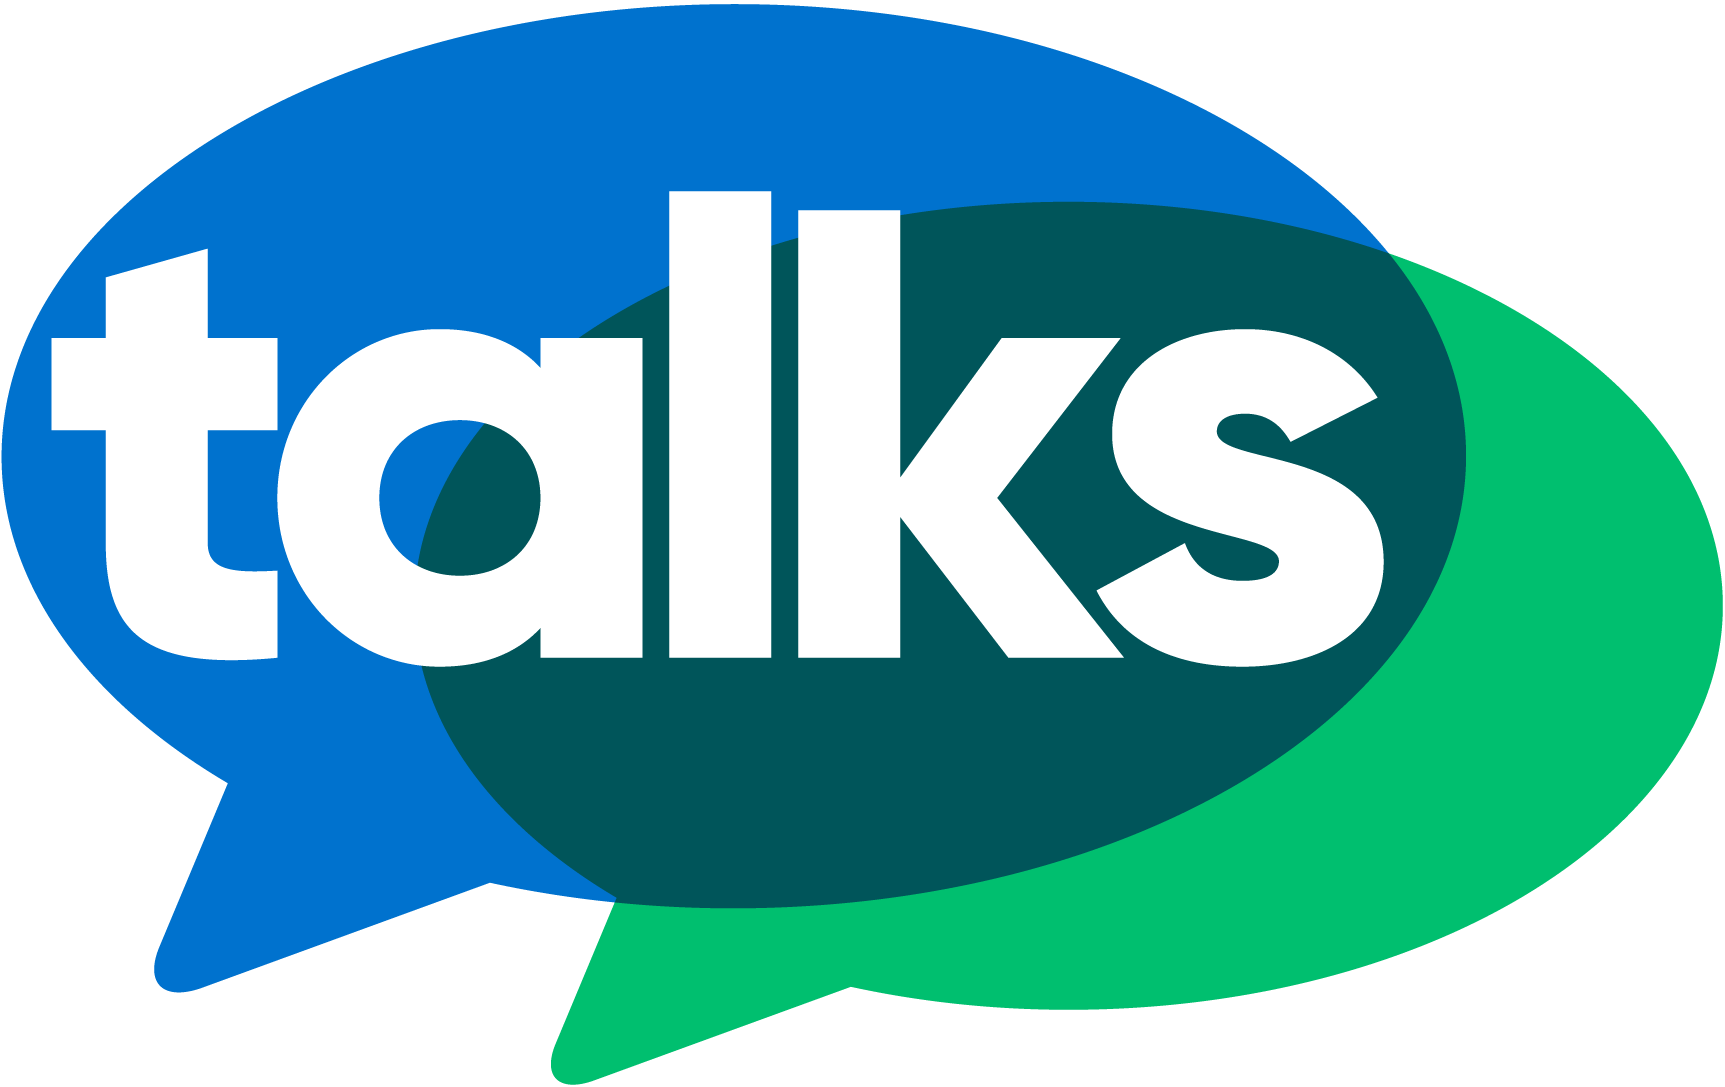 Corteva Talks logo